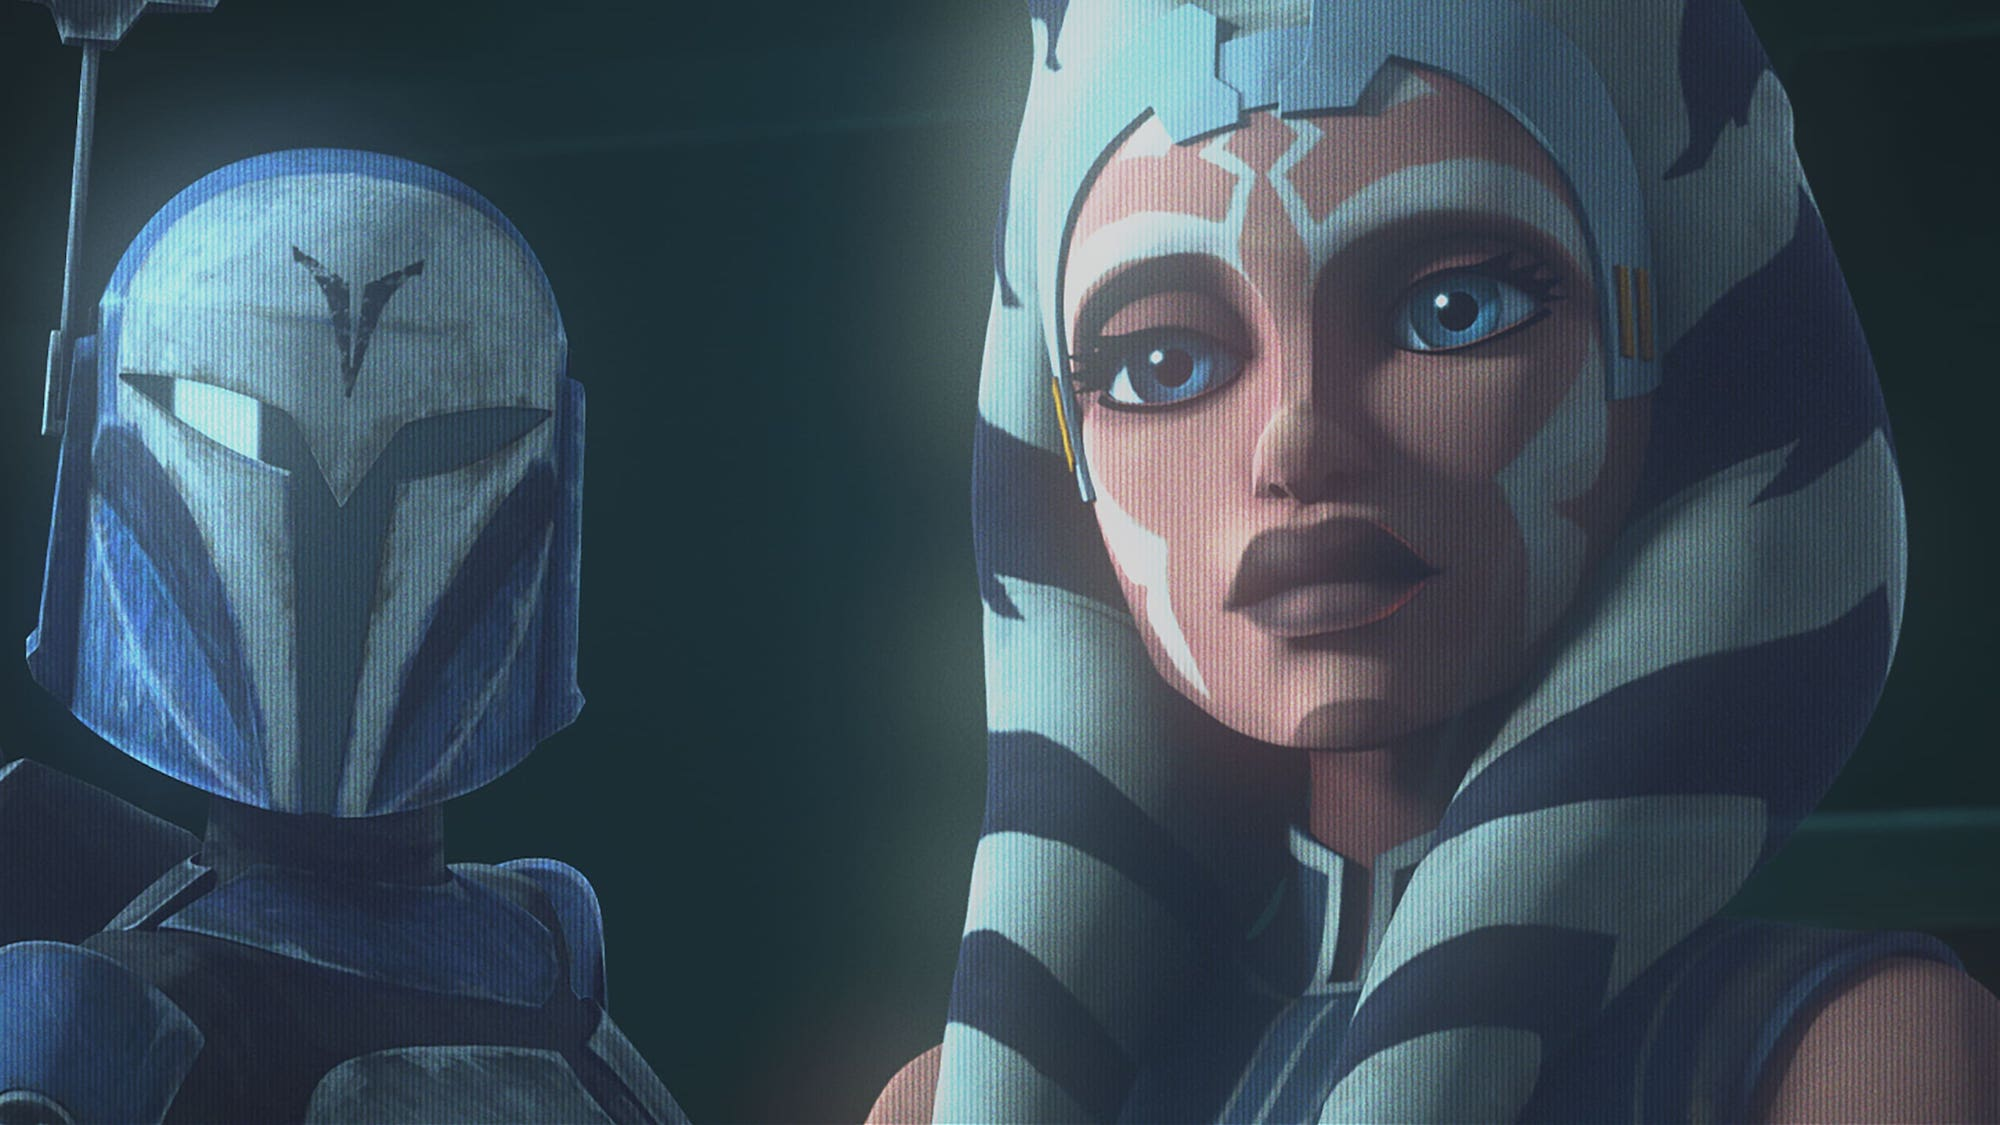 Ahsoka Tano speaks to Anakin Skywalker and Obi-Wan Kenobi through Hologram in Season 7 of 'Star Wars: The Clone Wars'